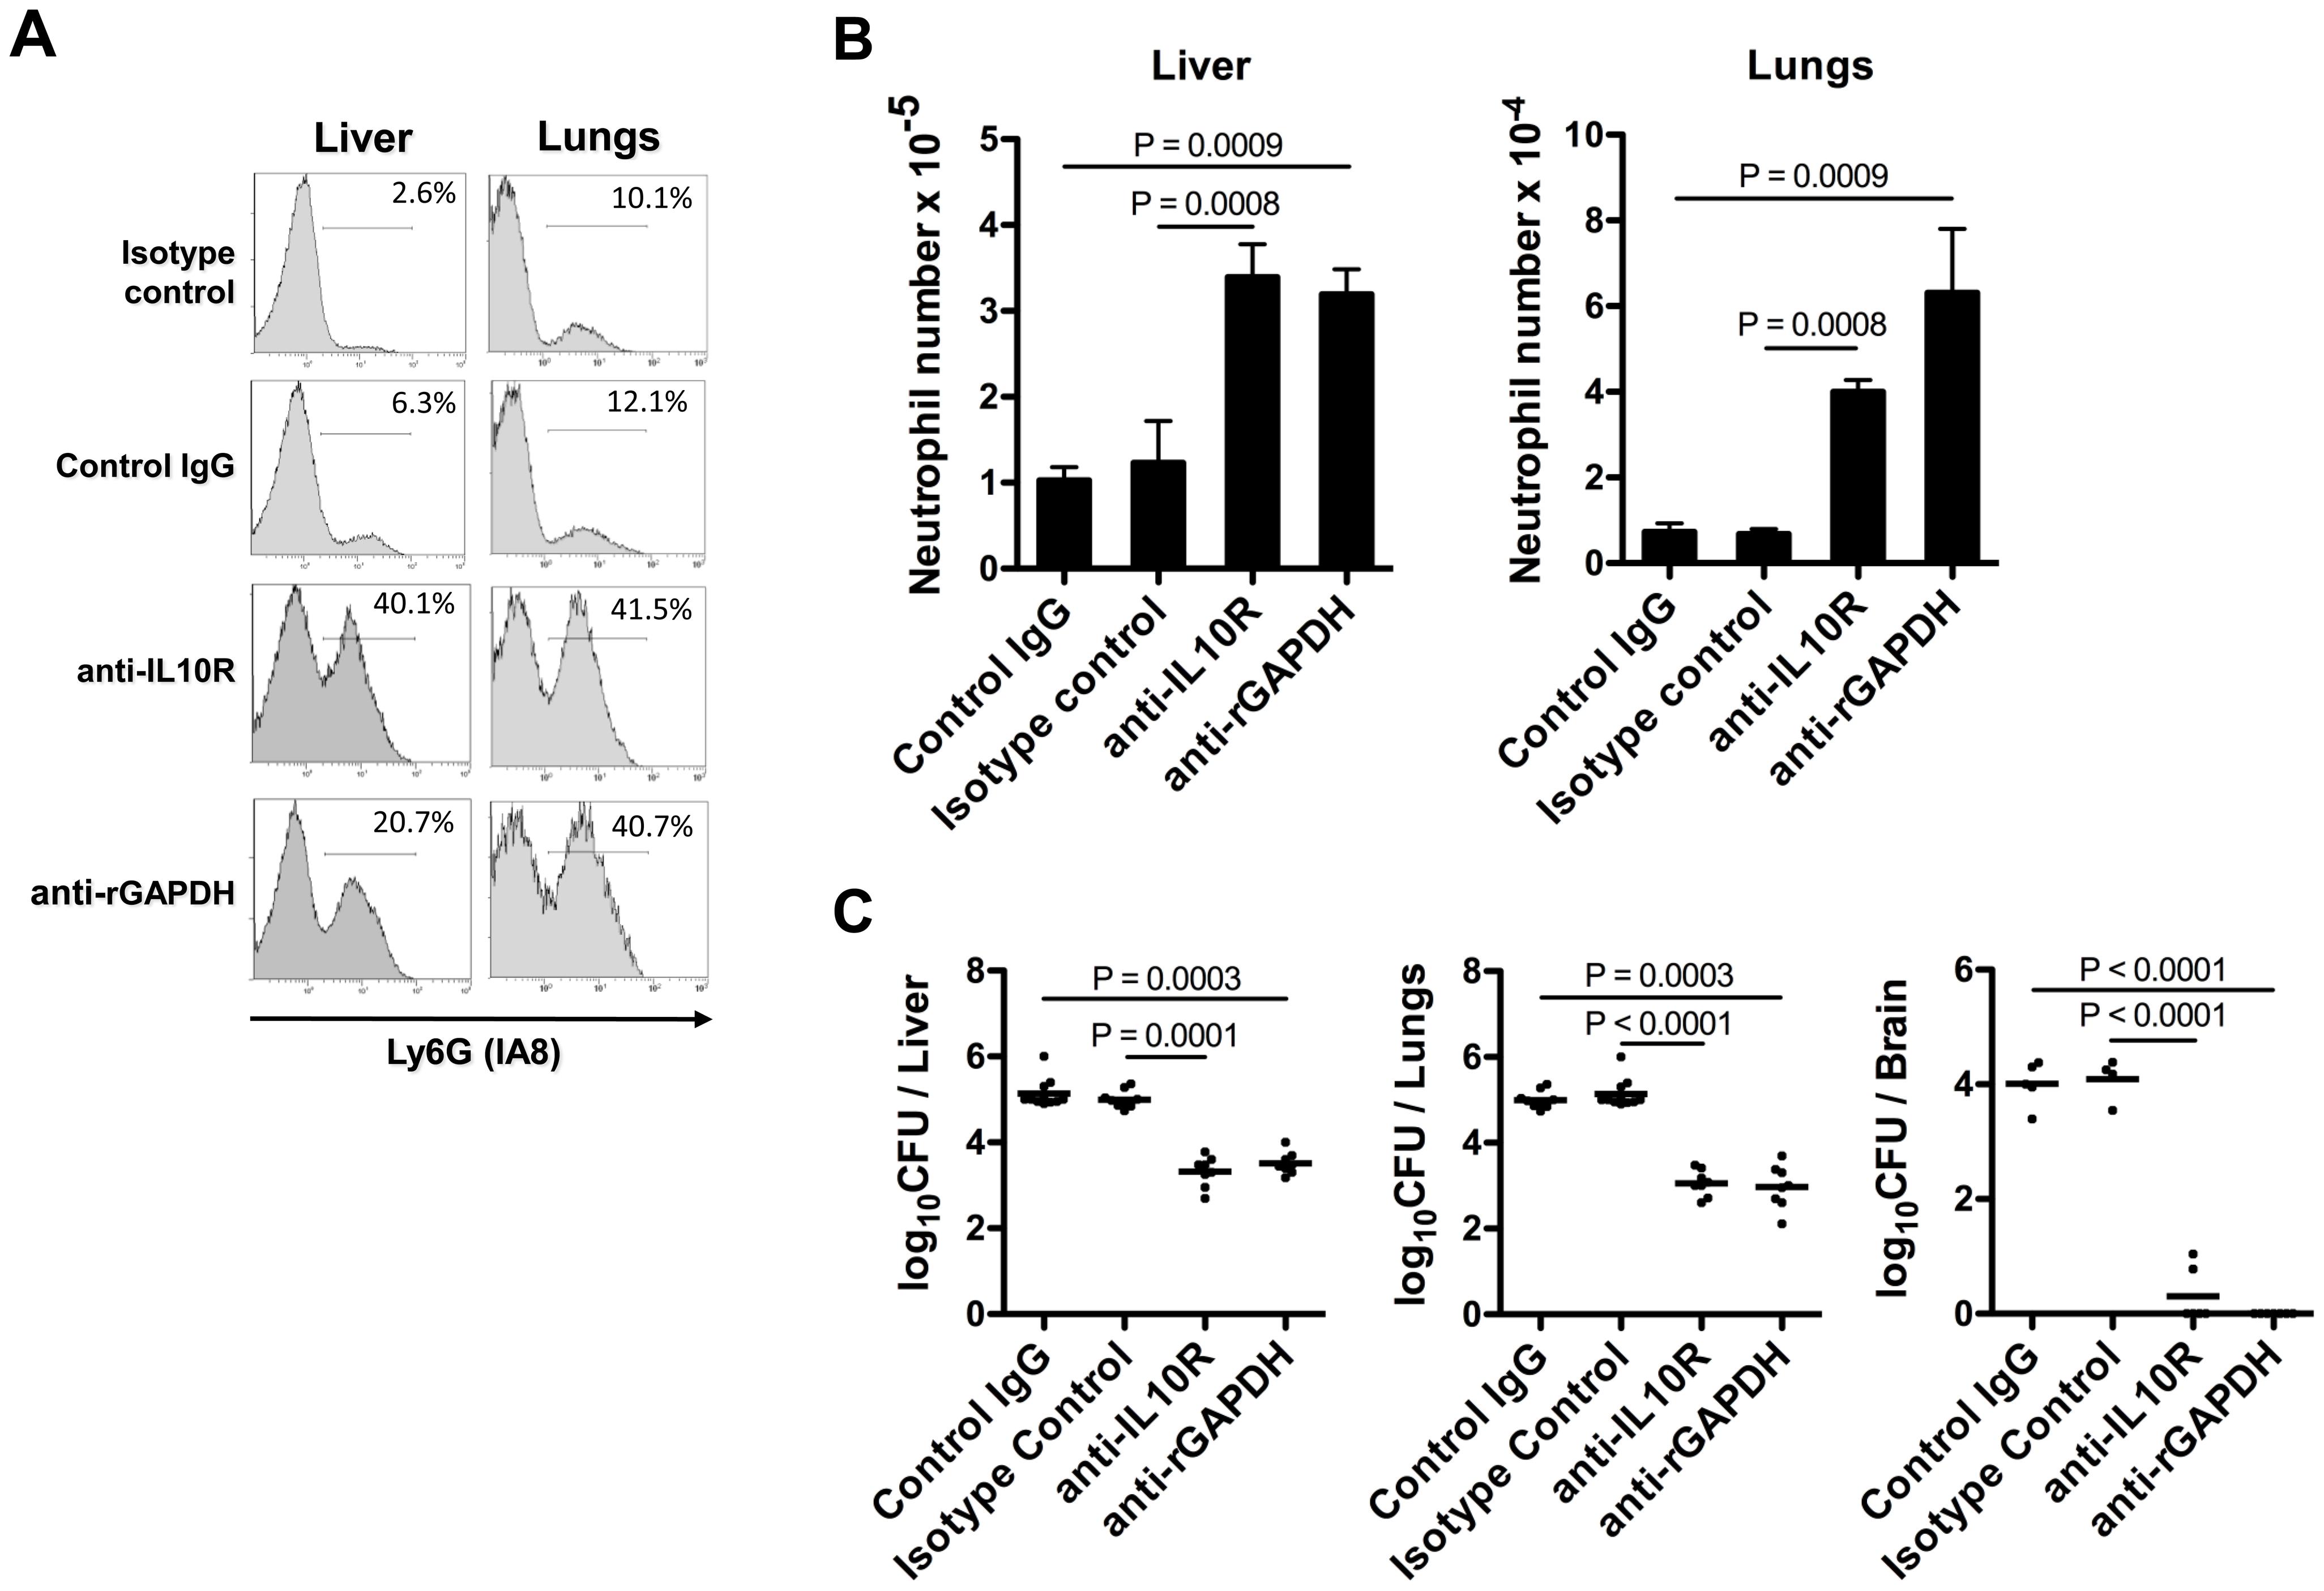 GAPDH-induced IL-10 blocks neutrophil recruitment in injured organs.